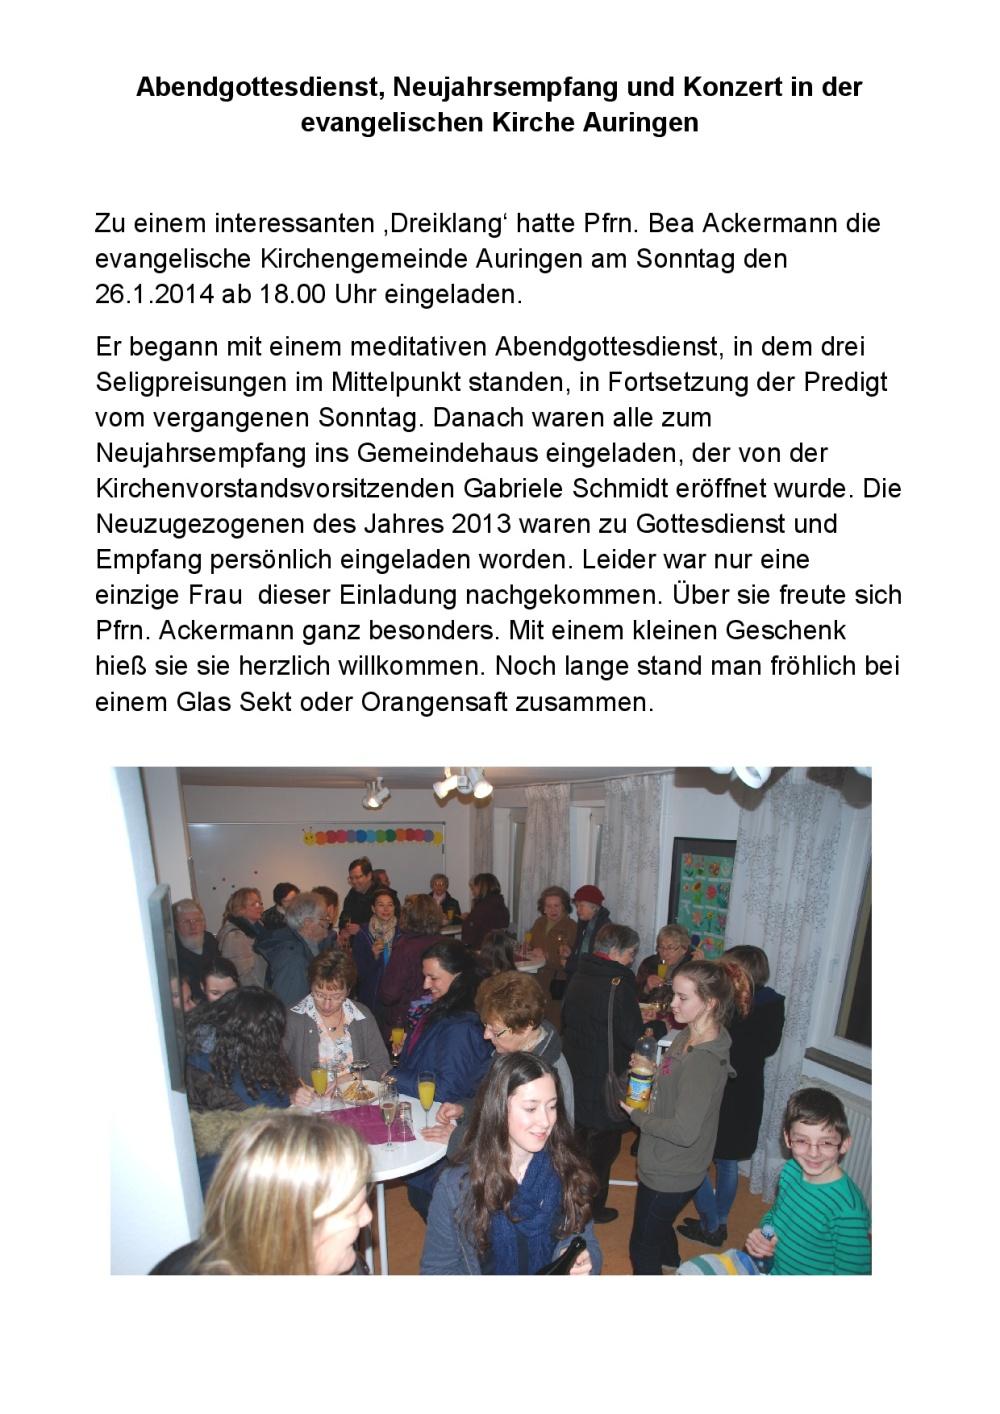 03-Godi Neujahrsempfang +Konzert 26.01.14-001